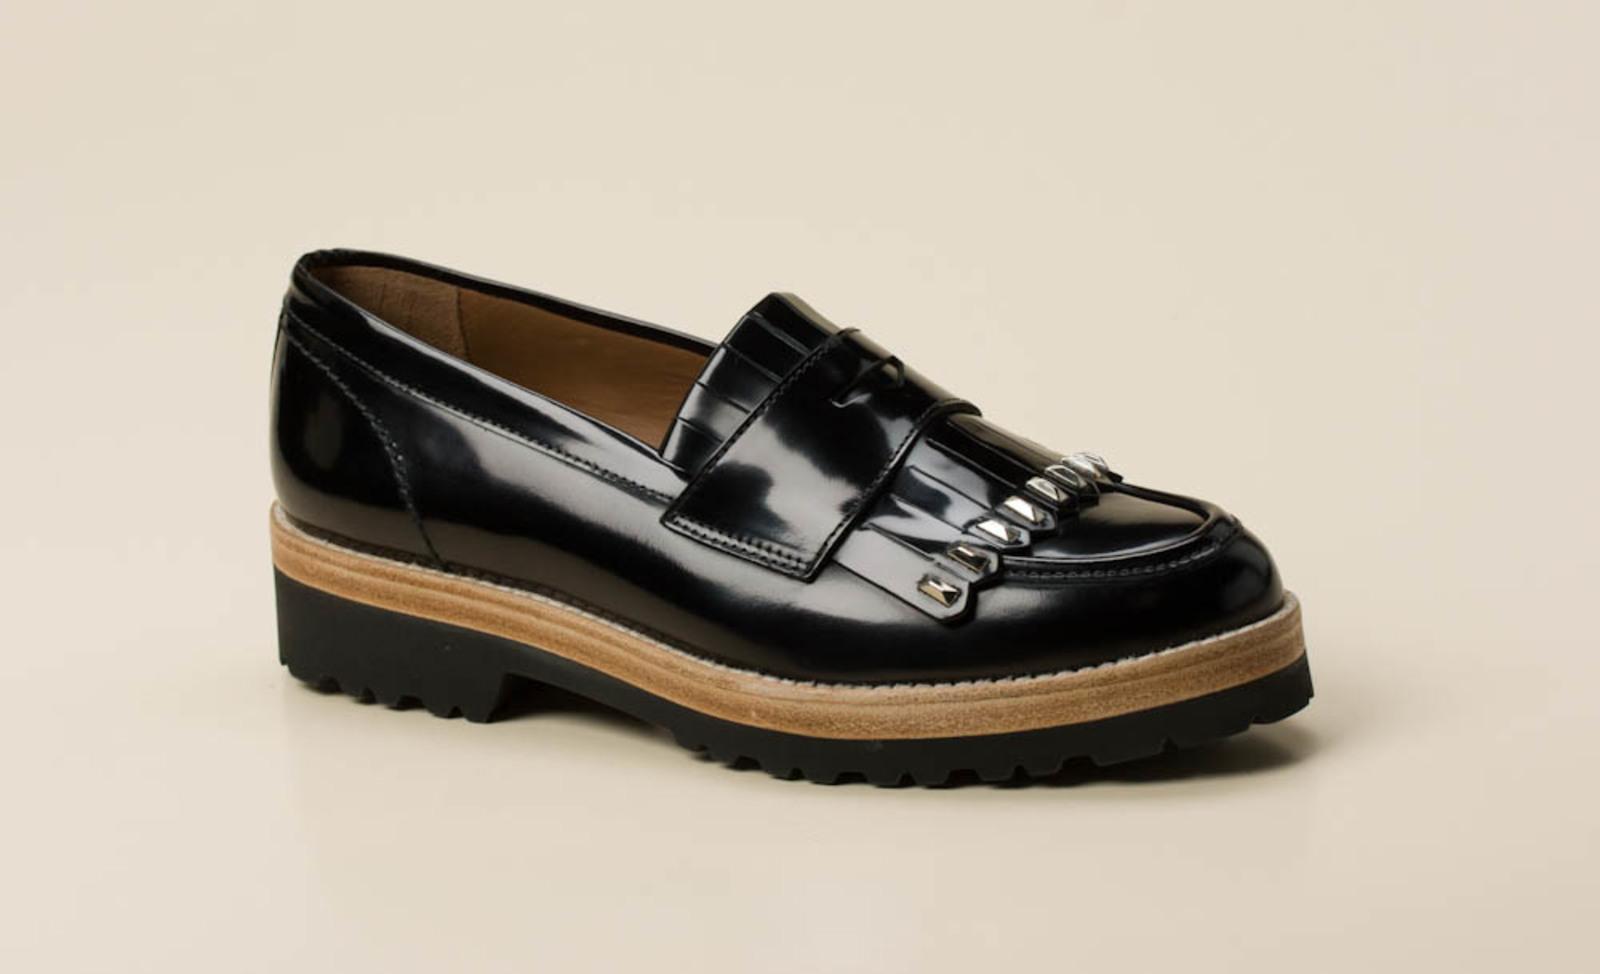 de5d0cf772f2 Pertini Damen Slipper in schwarz kaufen   Zumnorde Online-Shop